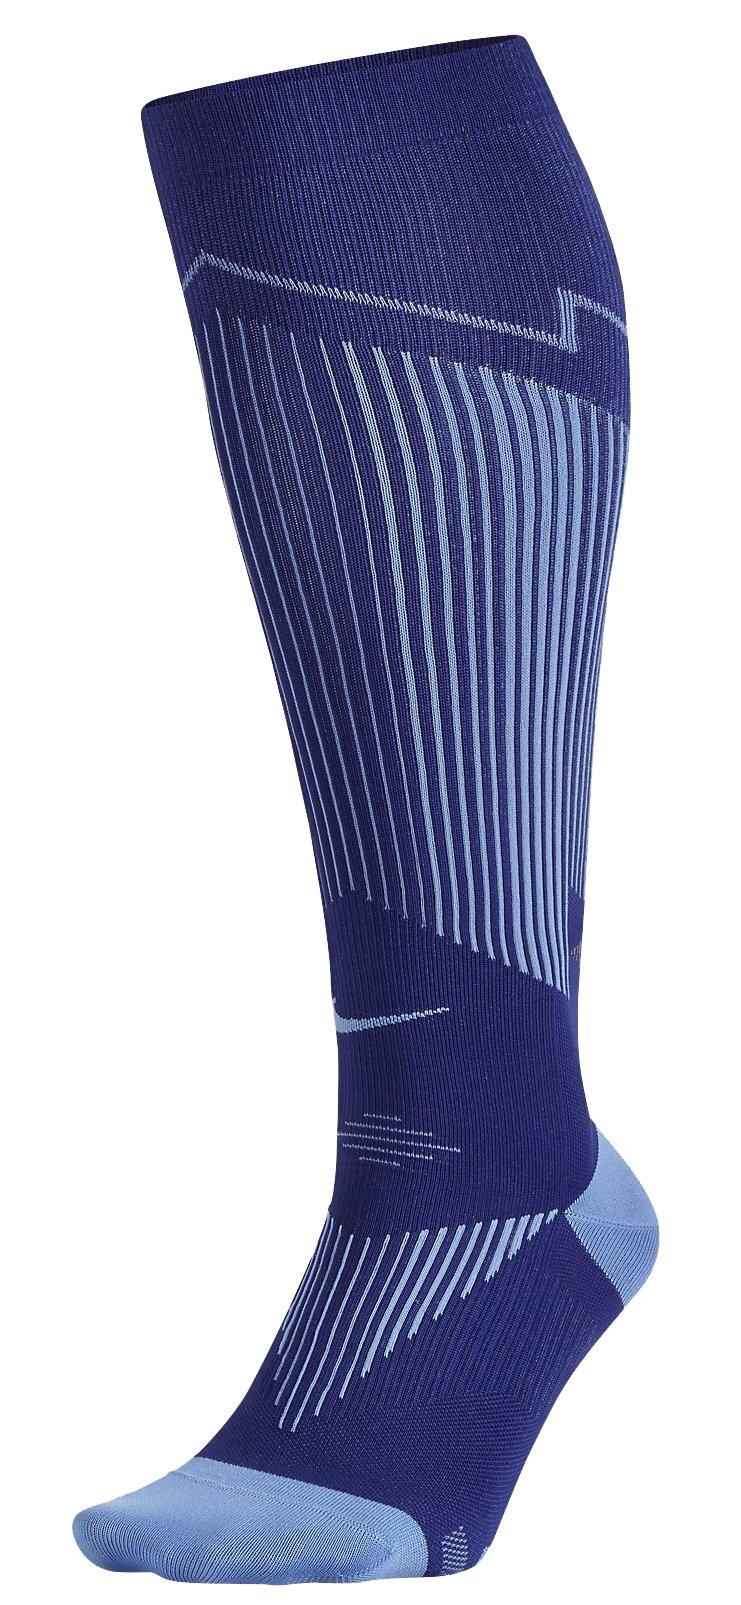 Ponožky Nike ELITE RUN HYP LTWT COMP